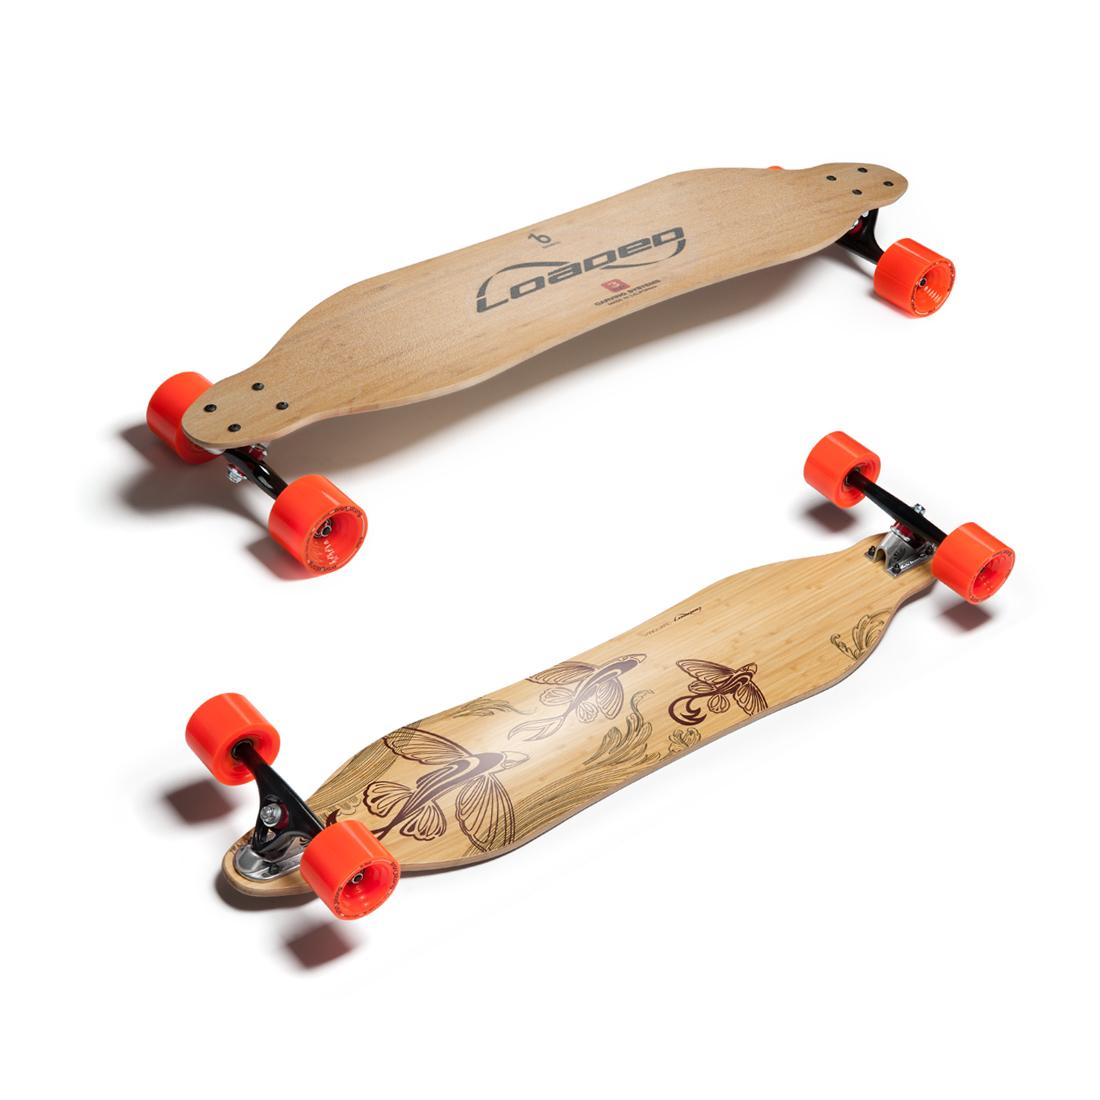 Loaded Board - Vanguard